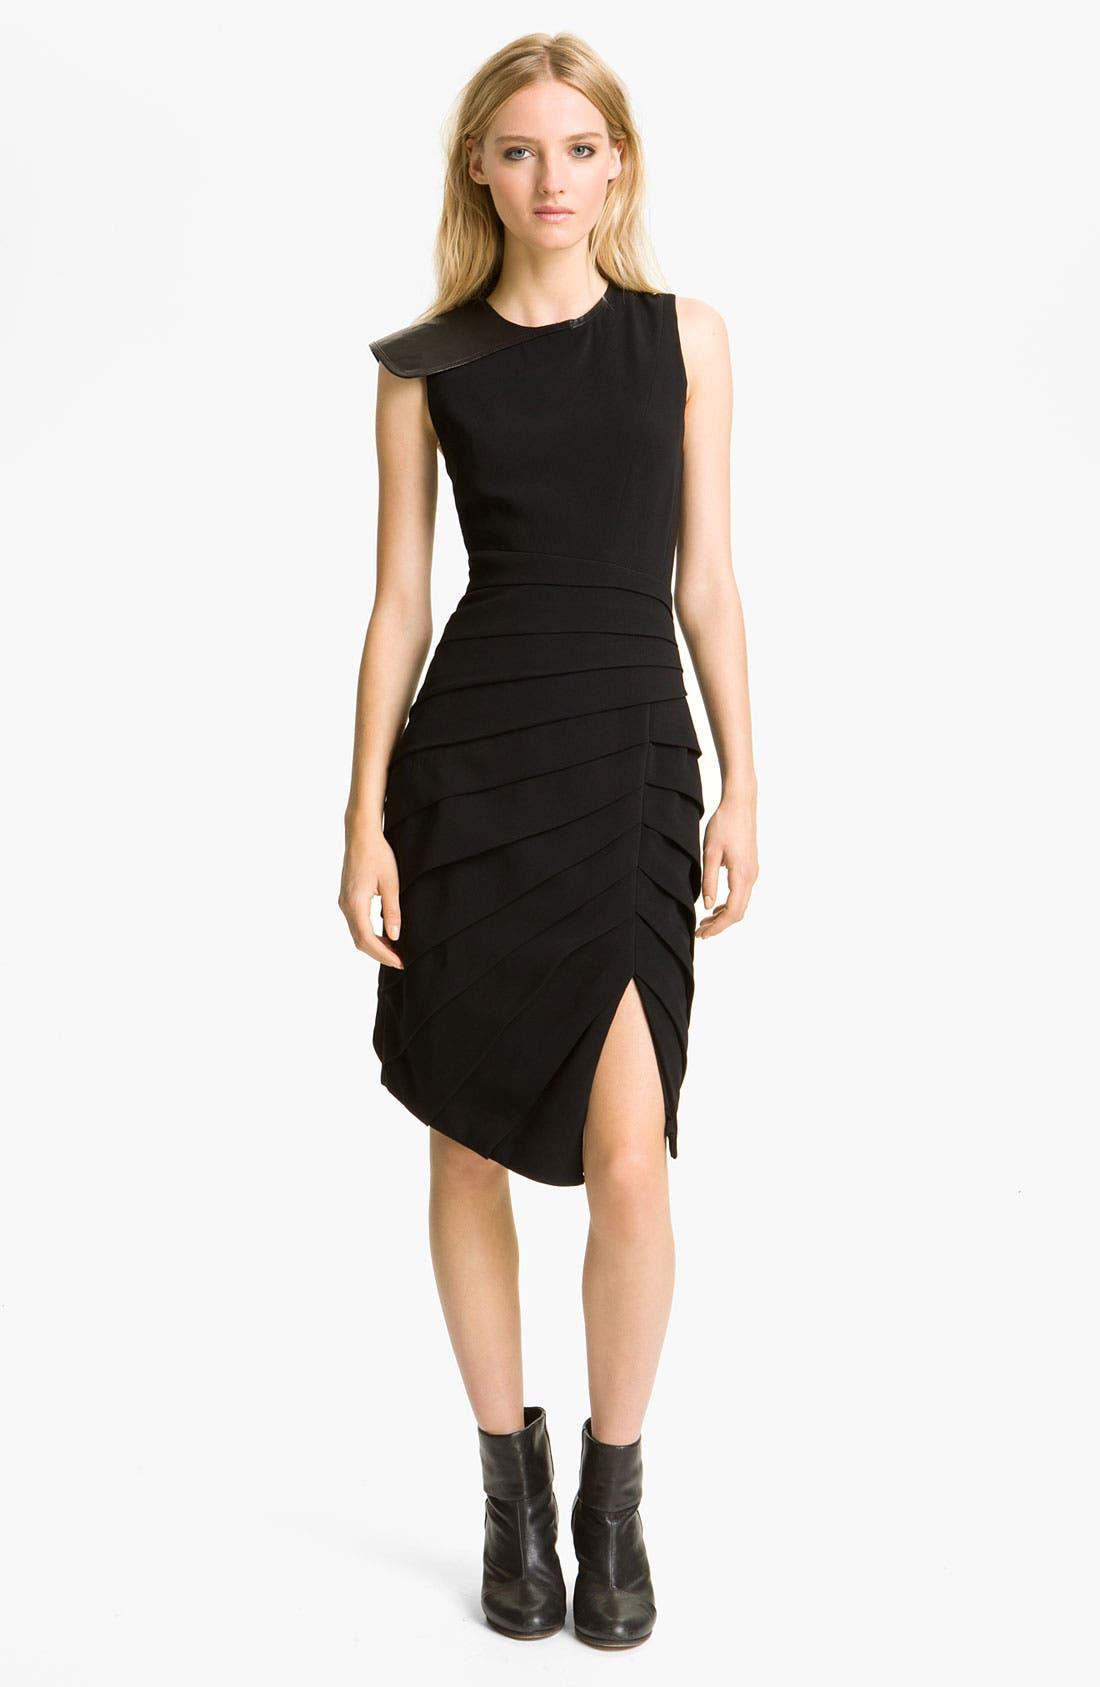 Alternate Image 1 Selected - rag & bone 'Origami' Leather Trim Dress